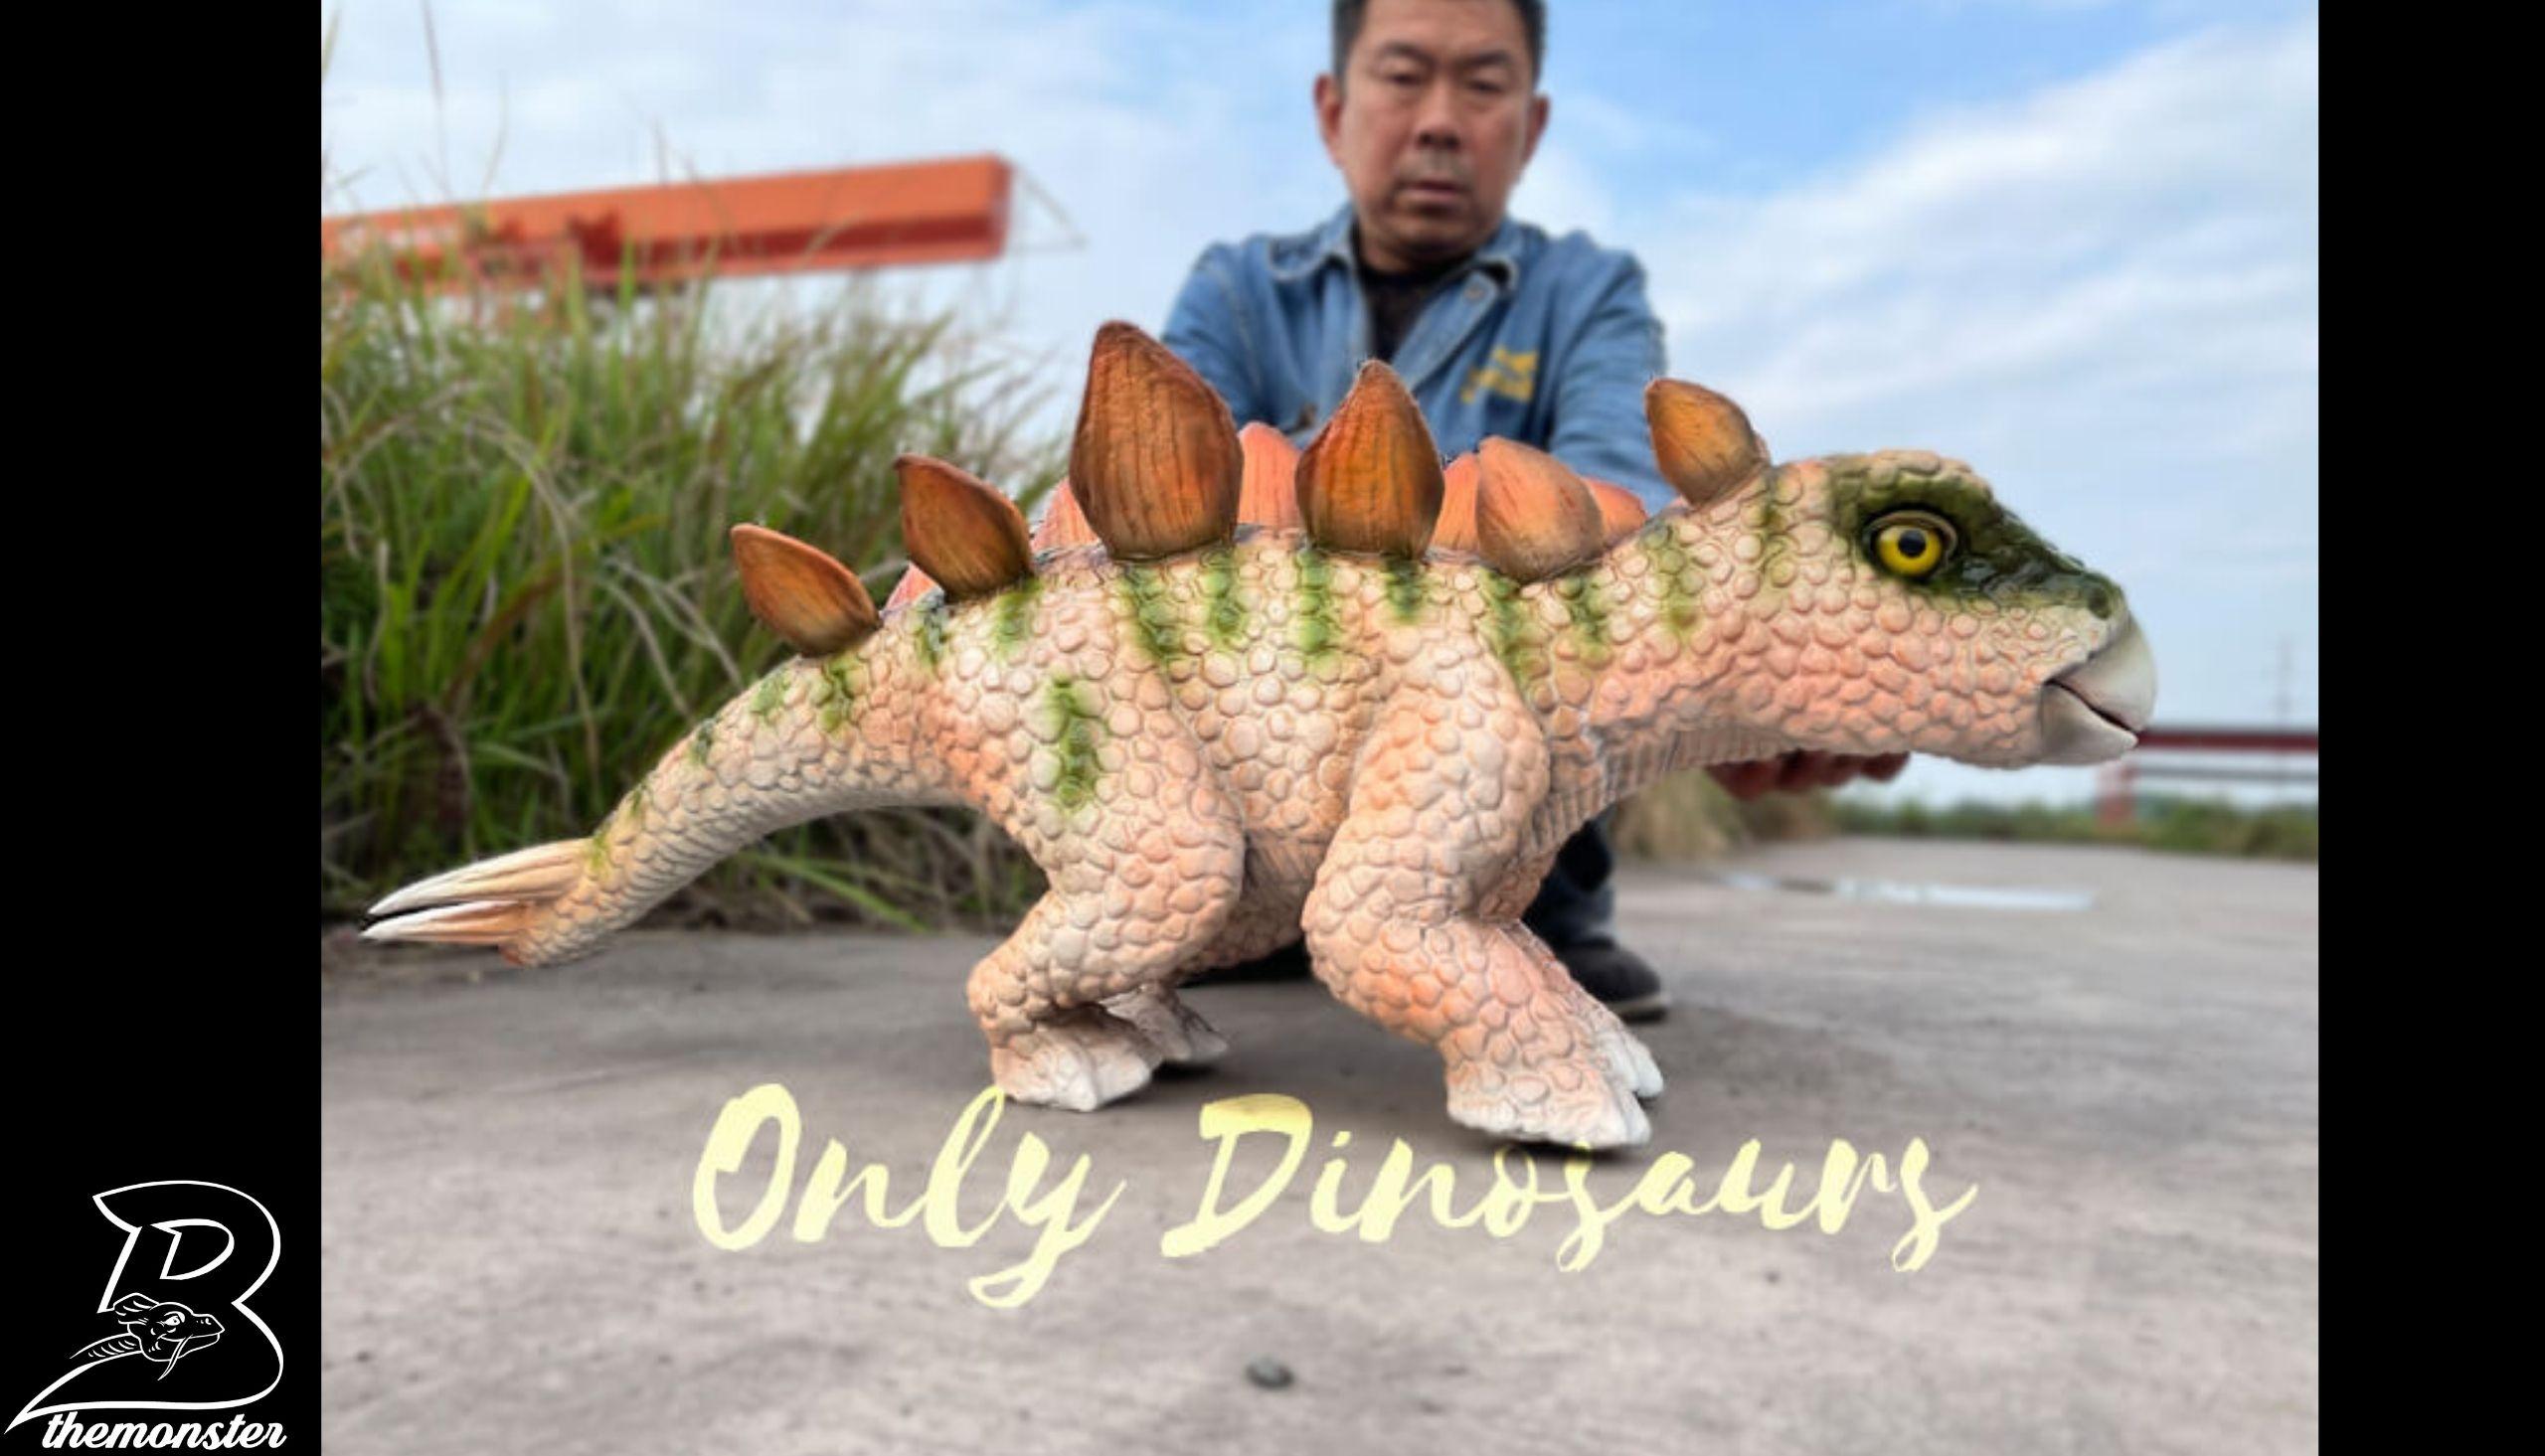 Adorable Baby Stegosaurus Dino Hand Puppet in vendita sul Bthemonster.com